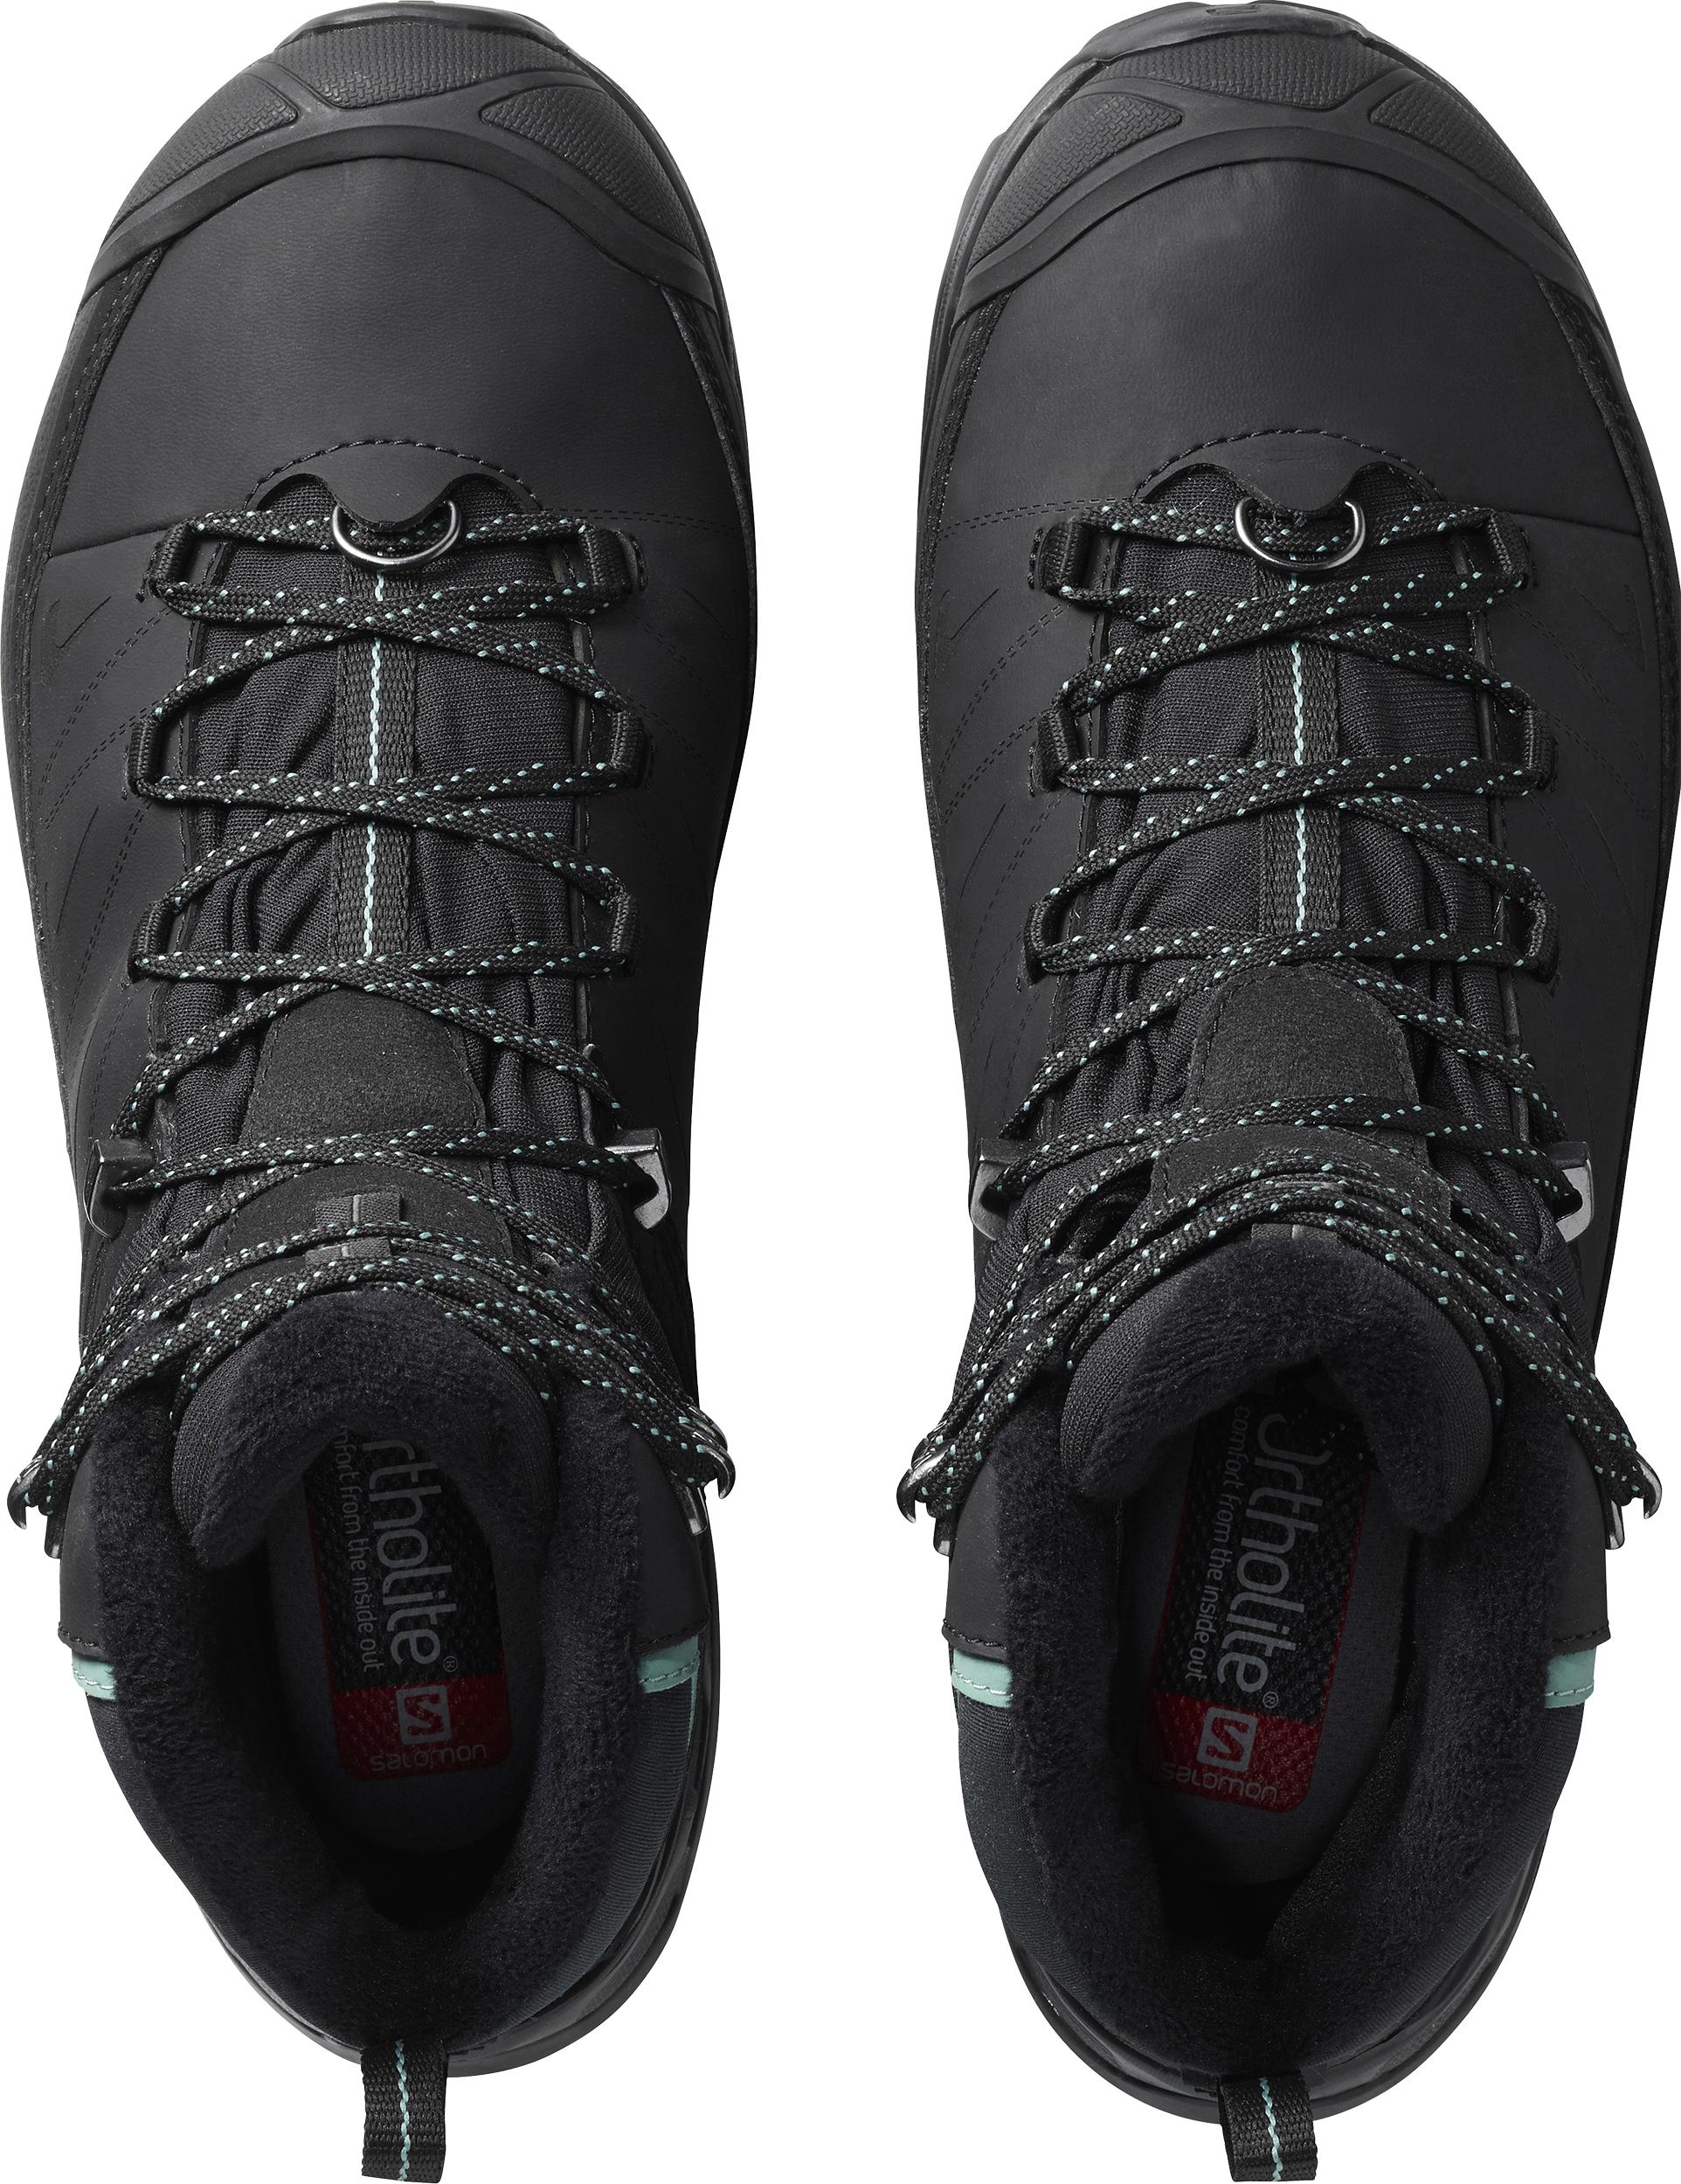 competitive price 015ba d4d20 Salomon X Ultra Mid Winter Waterproof Boots - Women's